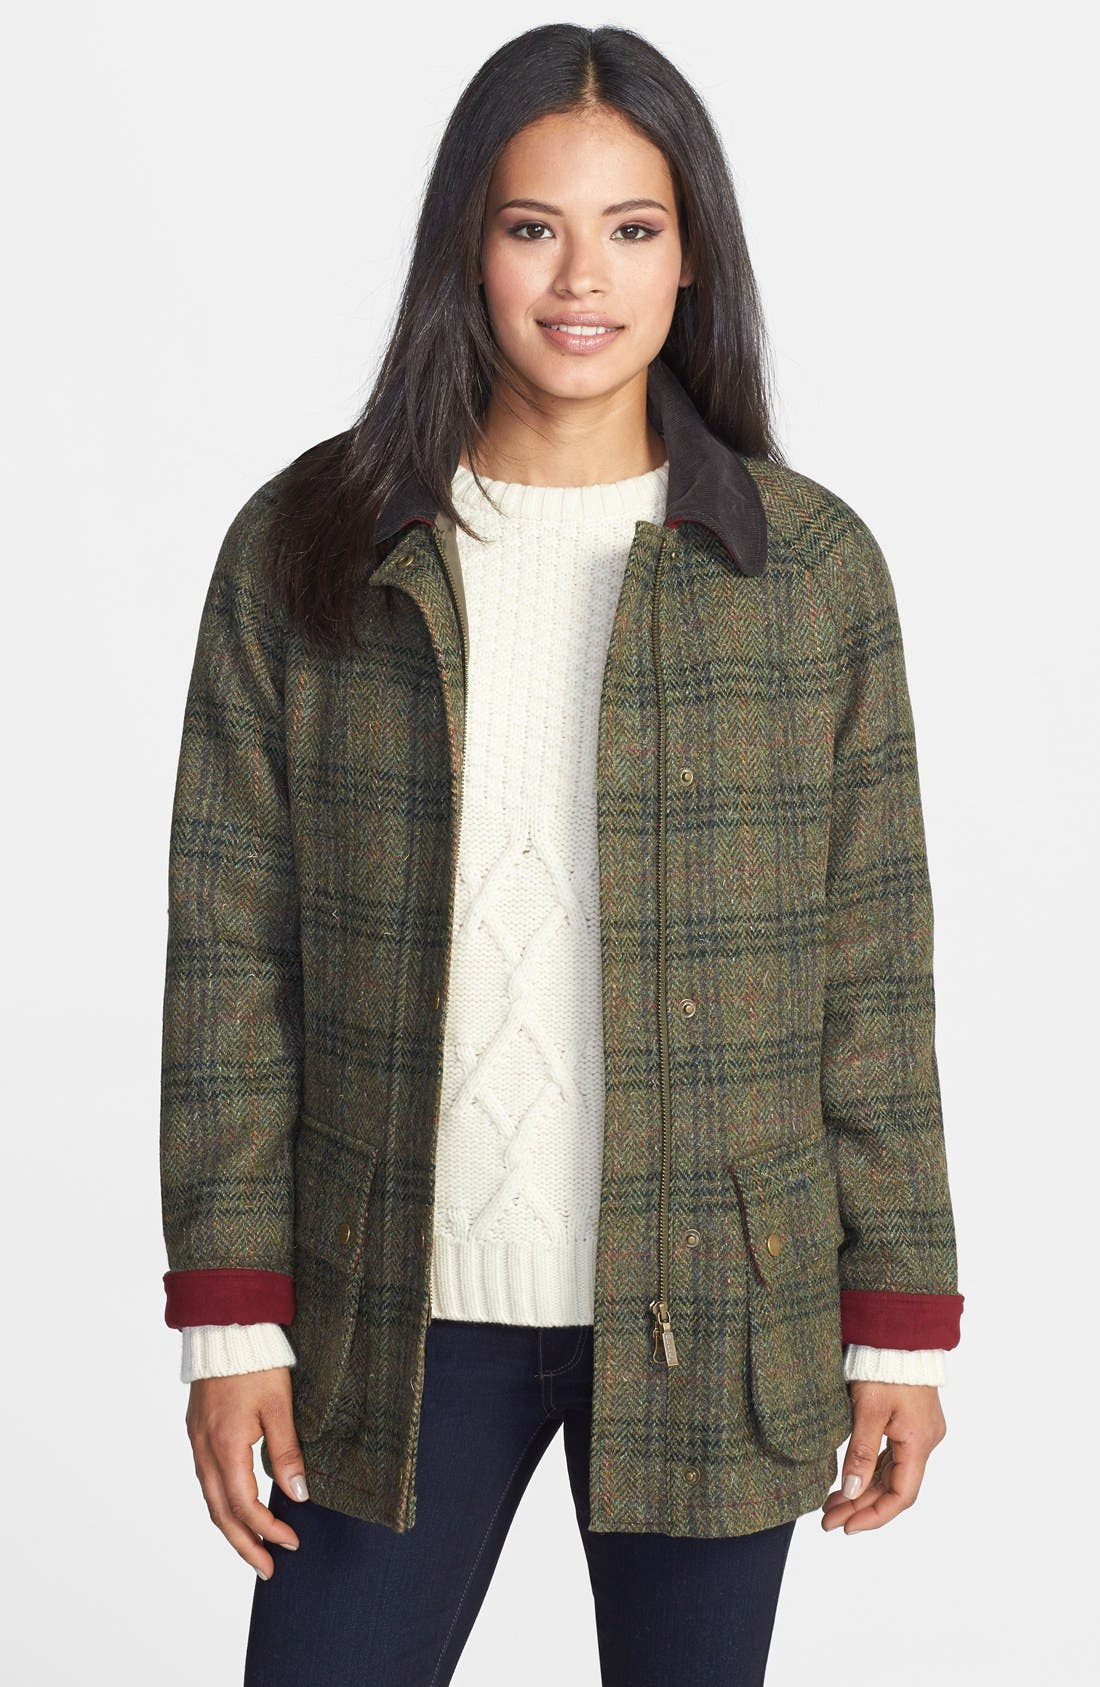 Main Image - Barbour 'Beadnell - Edworth Tweed' Plaid Wool Coat